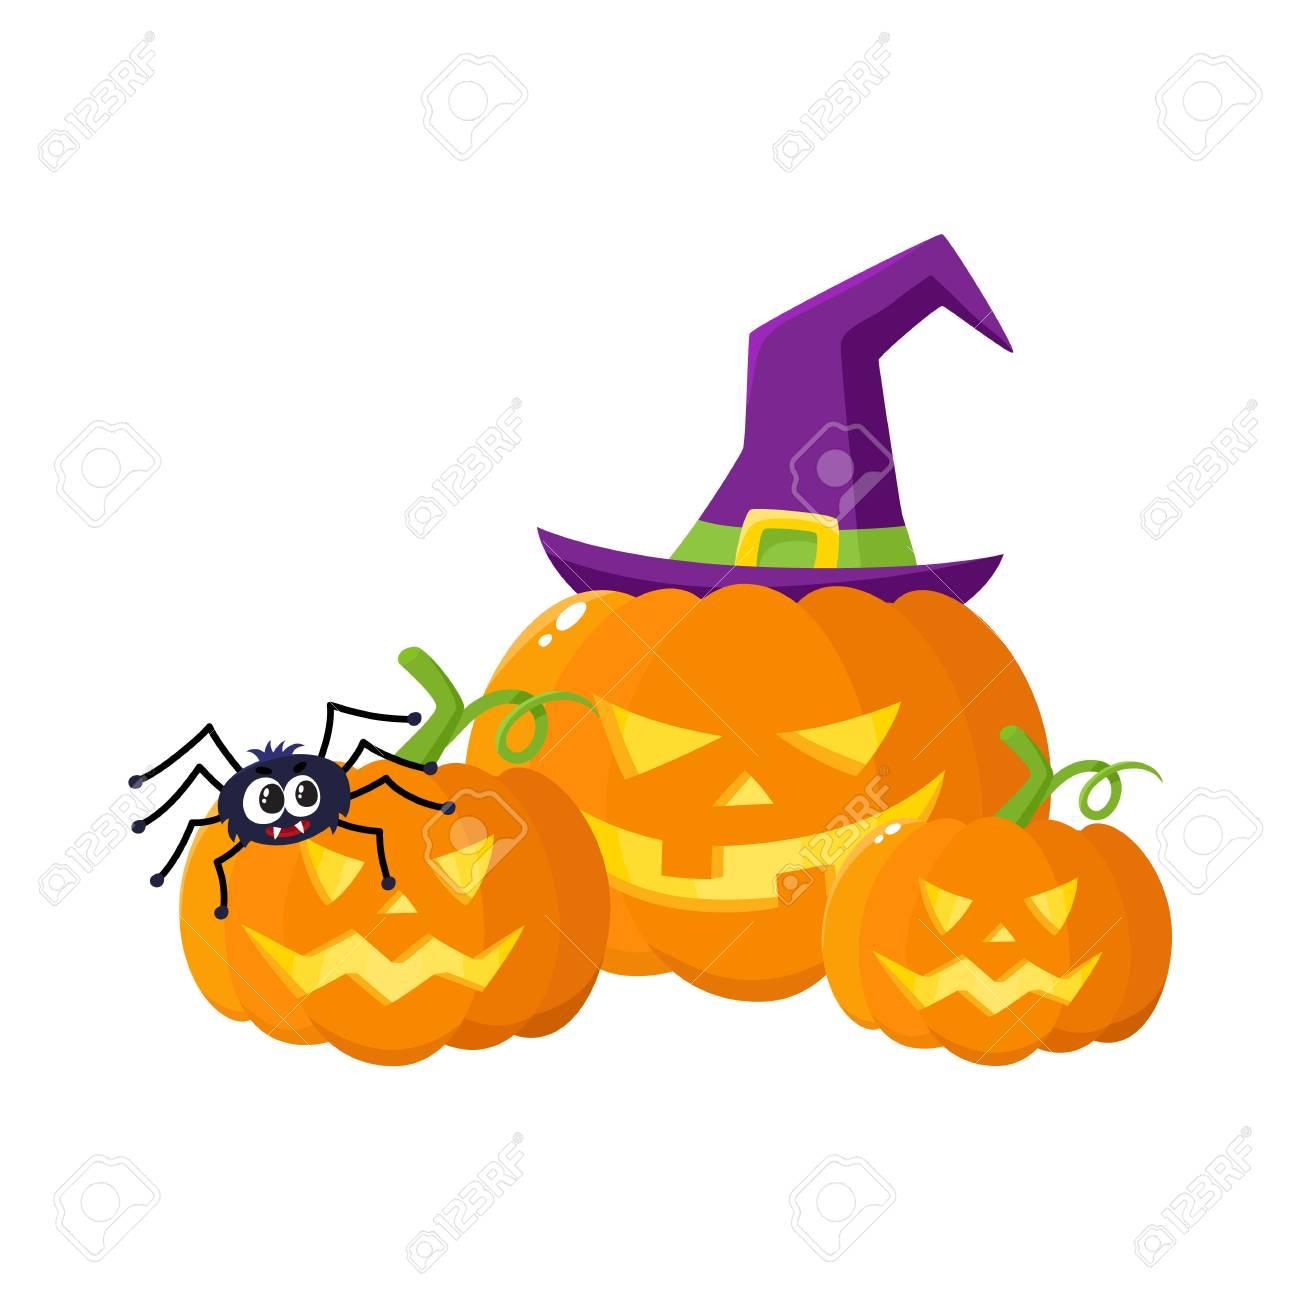 Three Hallowing Jack O Lanterns Pumpkins Big And Small In Royalty Free Cliparts Vectors And Stock Illustration Image 80559755